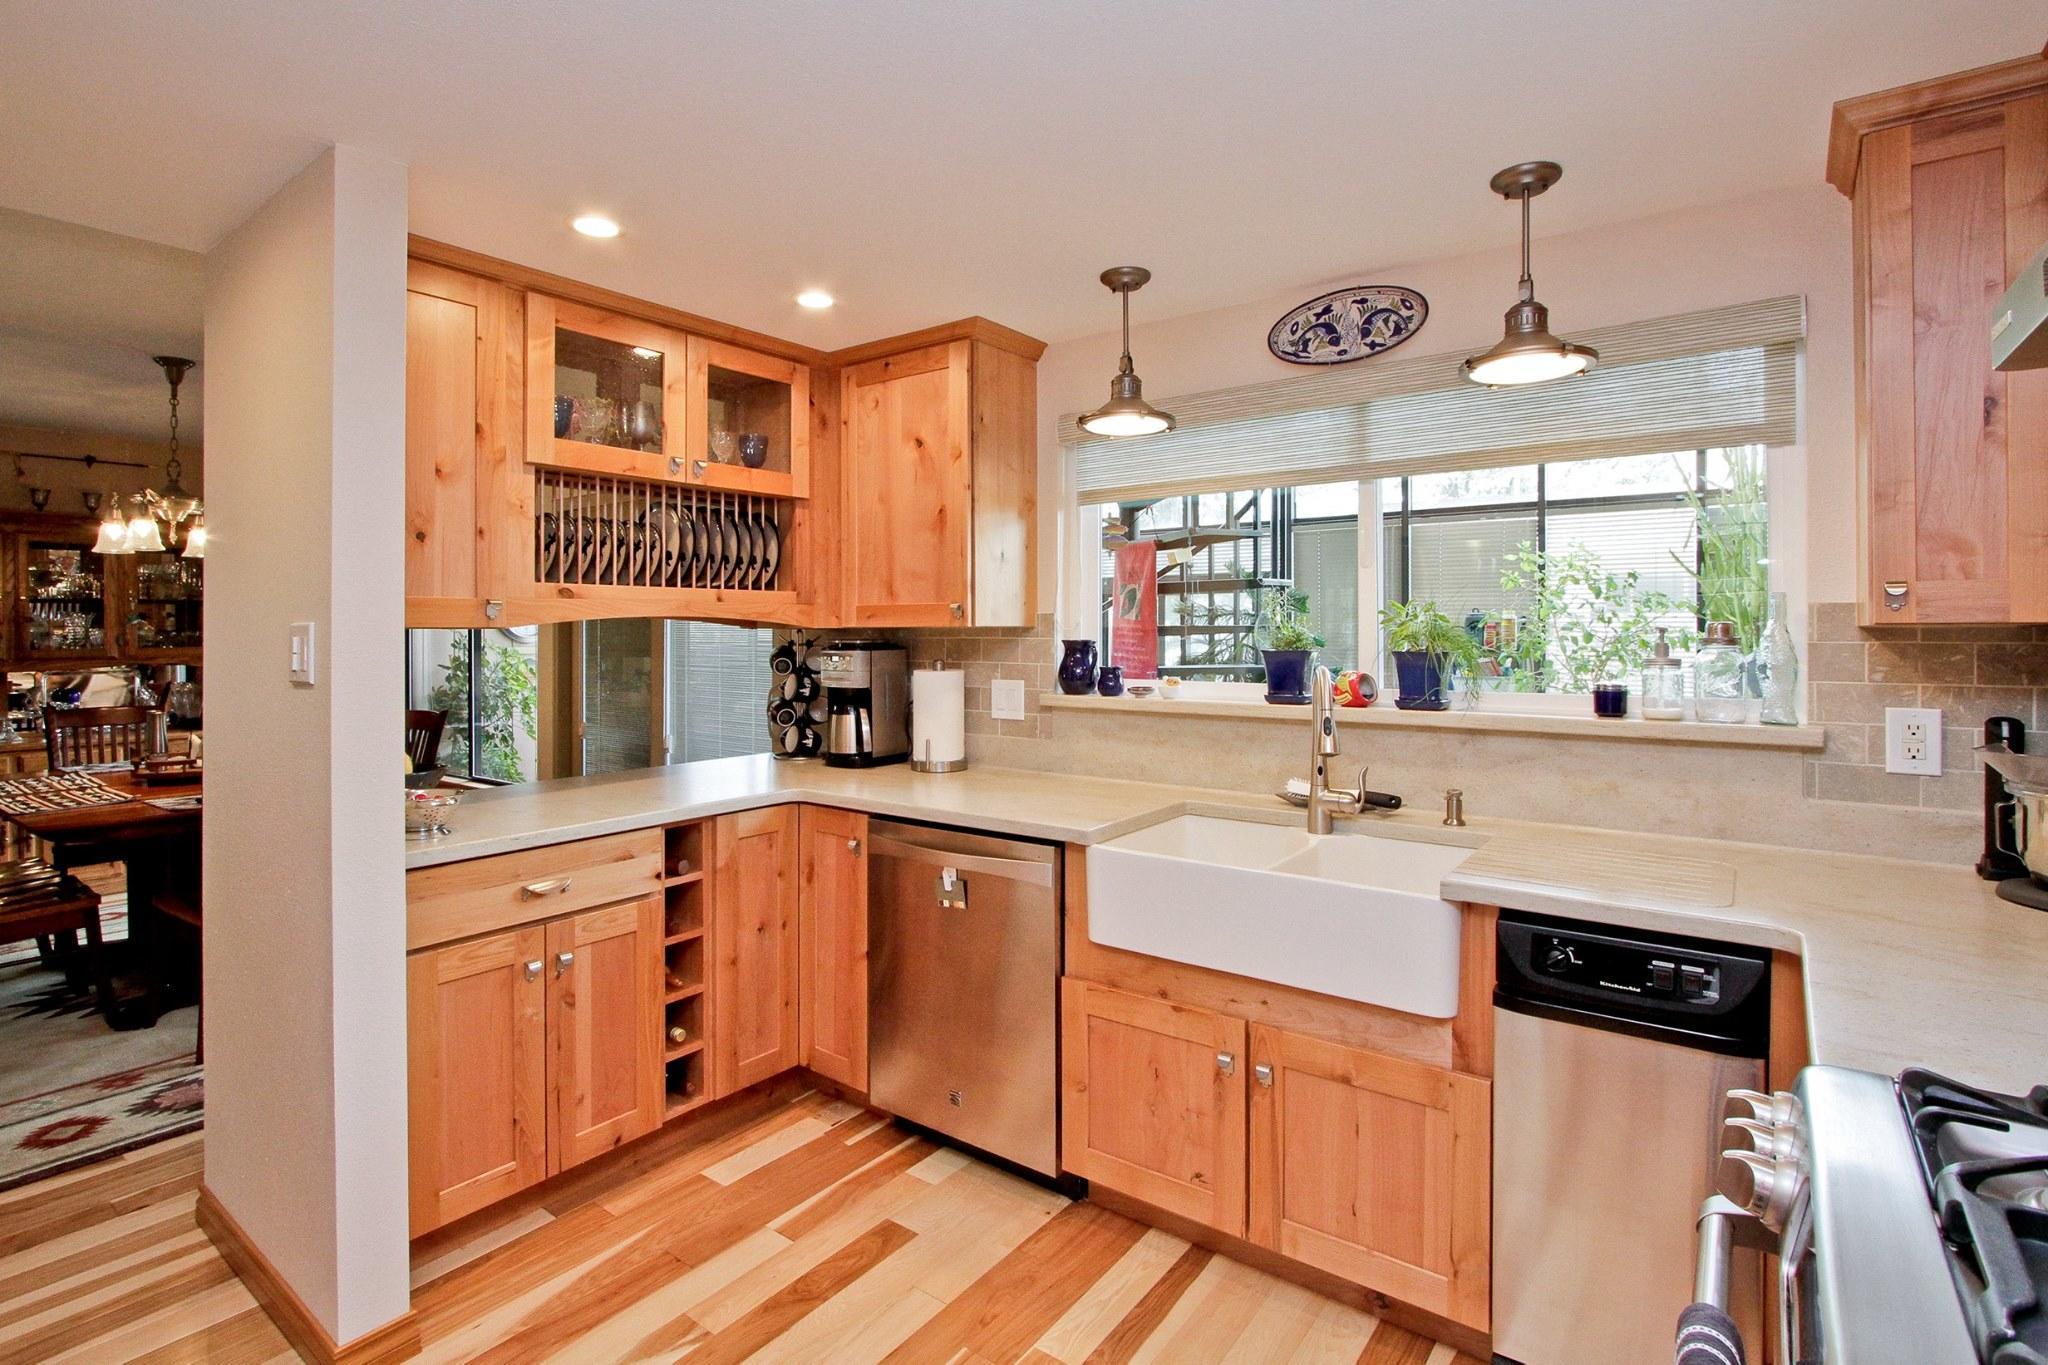 cress kitchen bath at 6770 w 38th ave wheat ridge co on fave